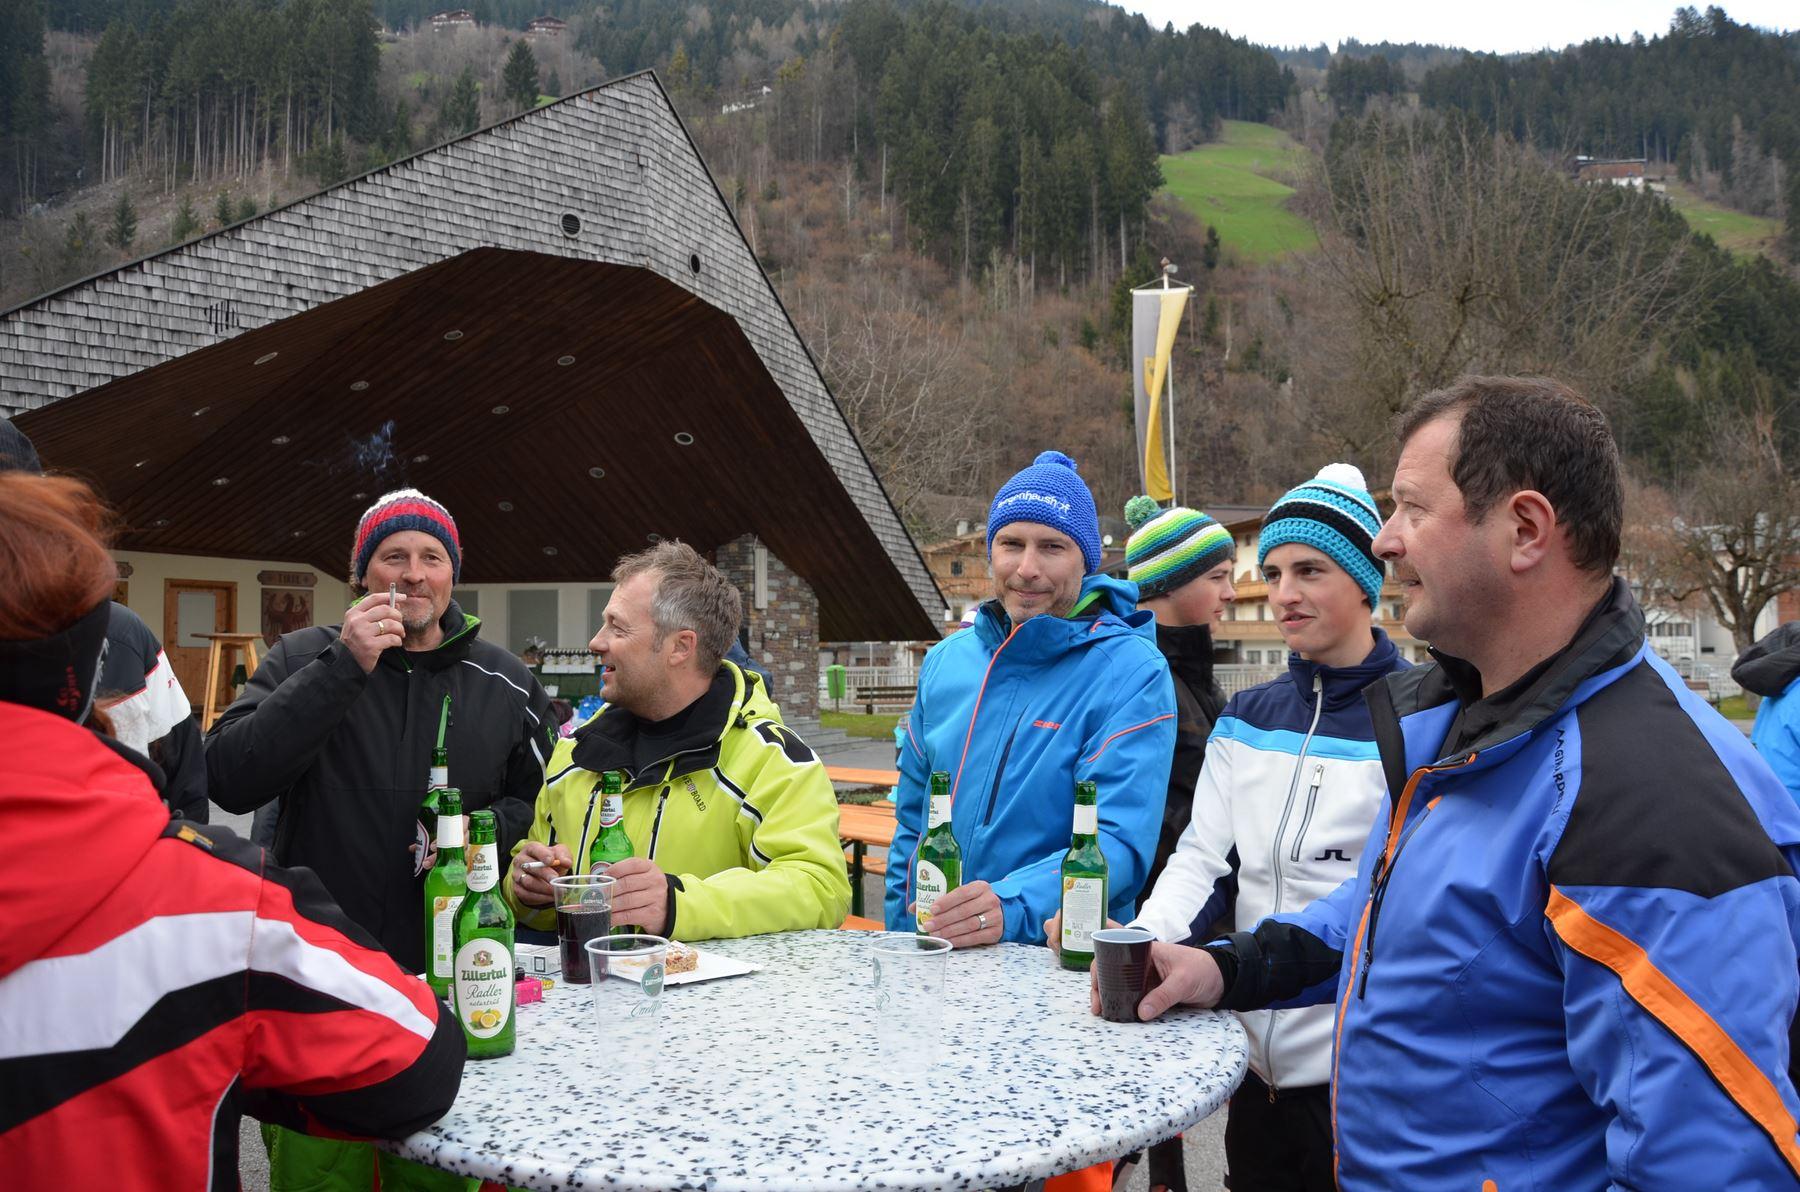 2015-03-22 BV Zillertal Skirennen 340.JPG